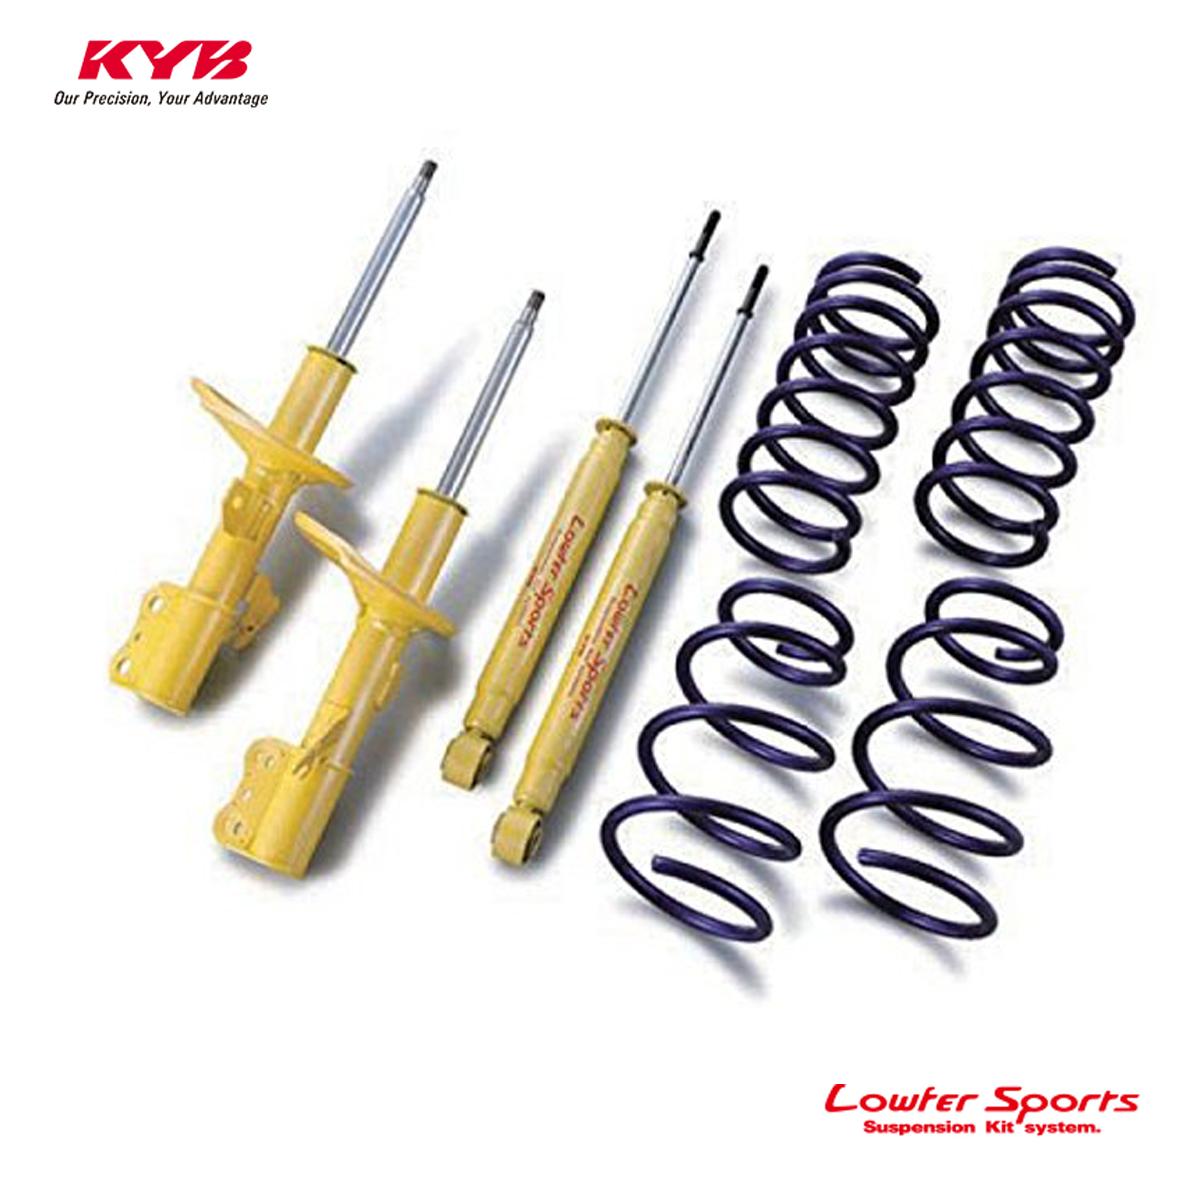 KYB カヤバ CX-5 KE2AW ショックアブソーバー サスペンションキット 1台分 ローファースポーツ キット Lowfer Sports LKIT-KE2AW8